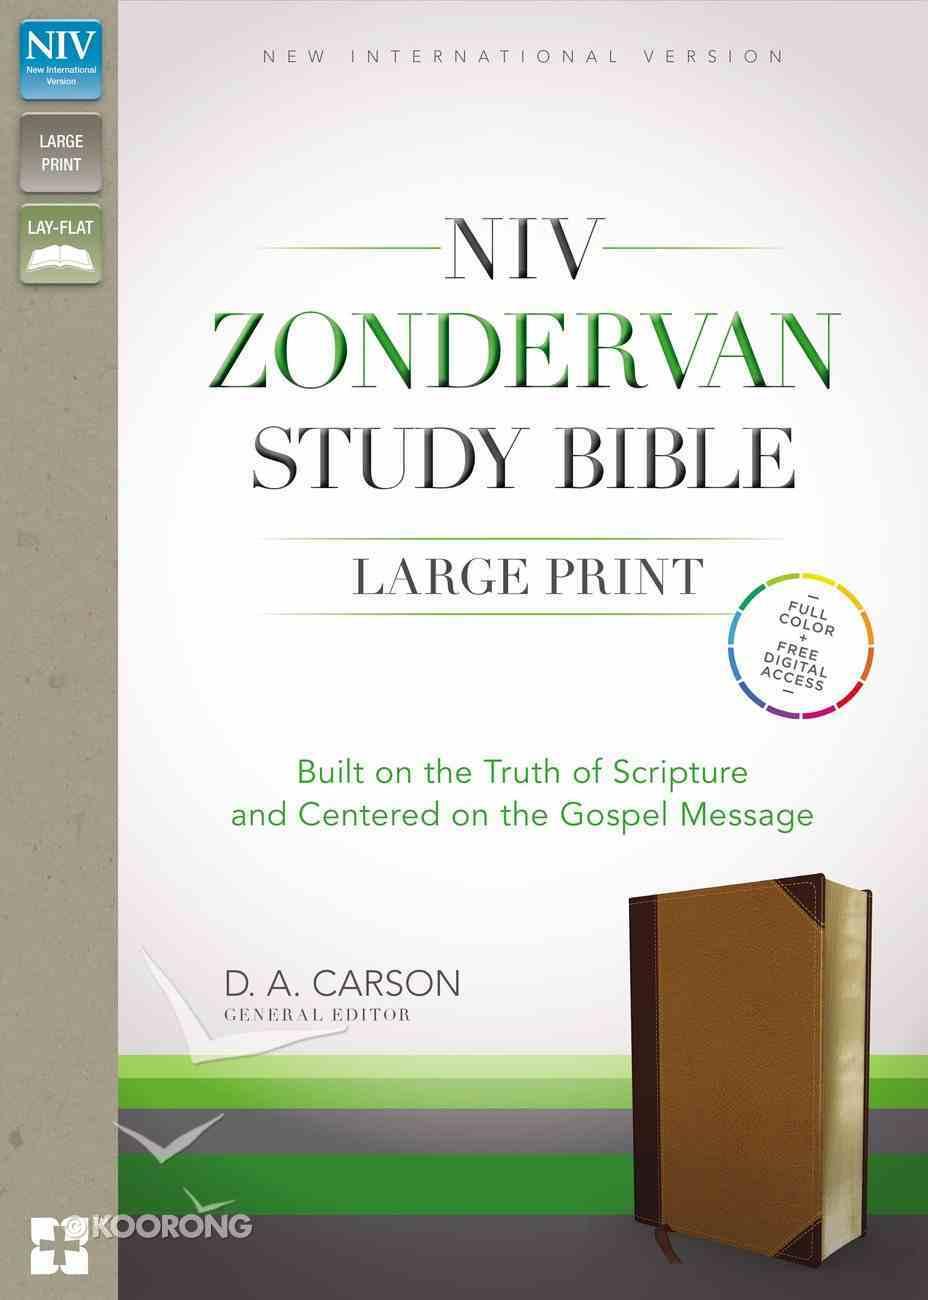 NIV Zondervan Study Bible Large Print Indexed Brown/Tan (Black Letter Edition) Premium Imitation Leather